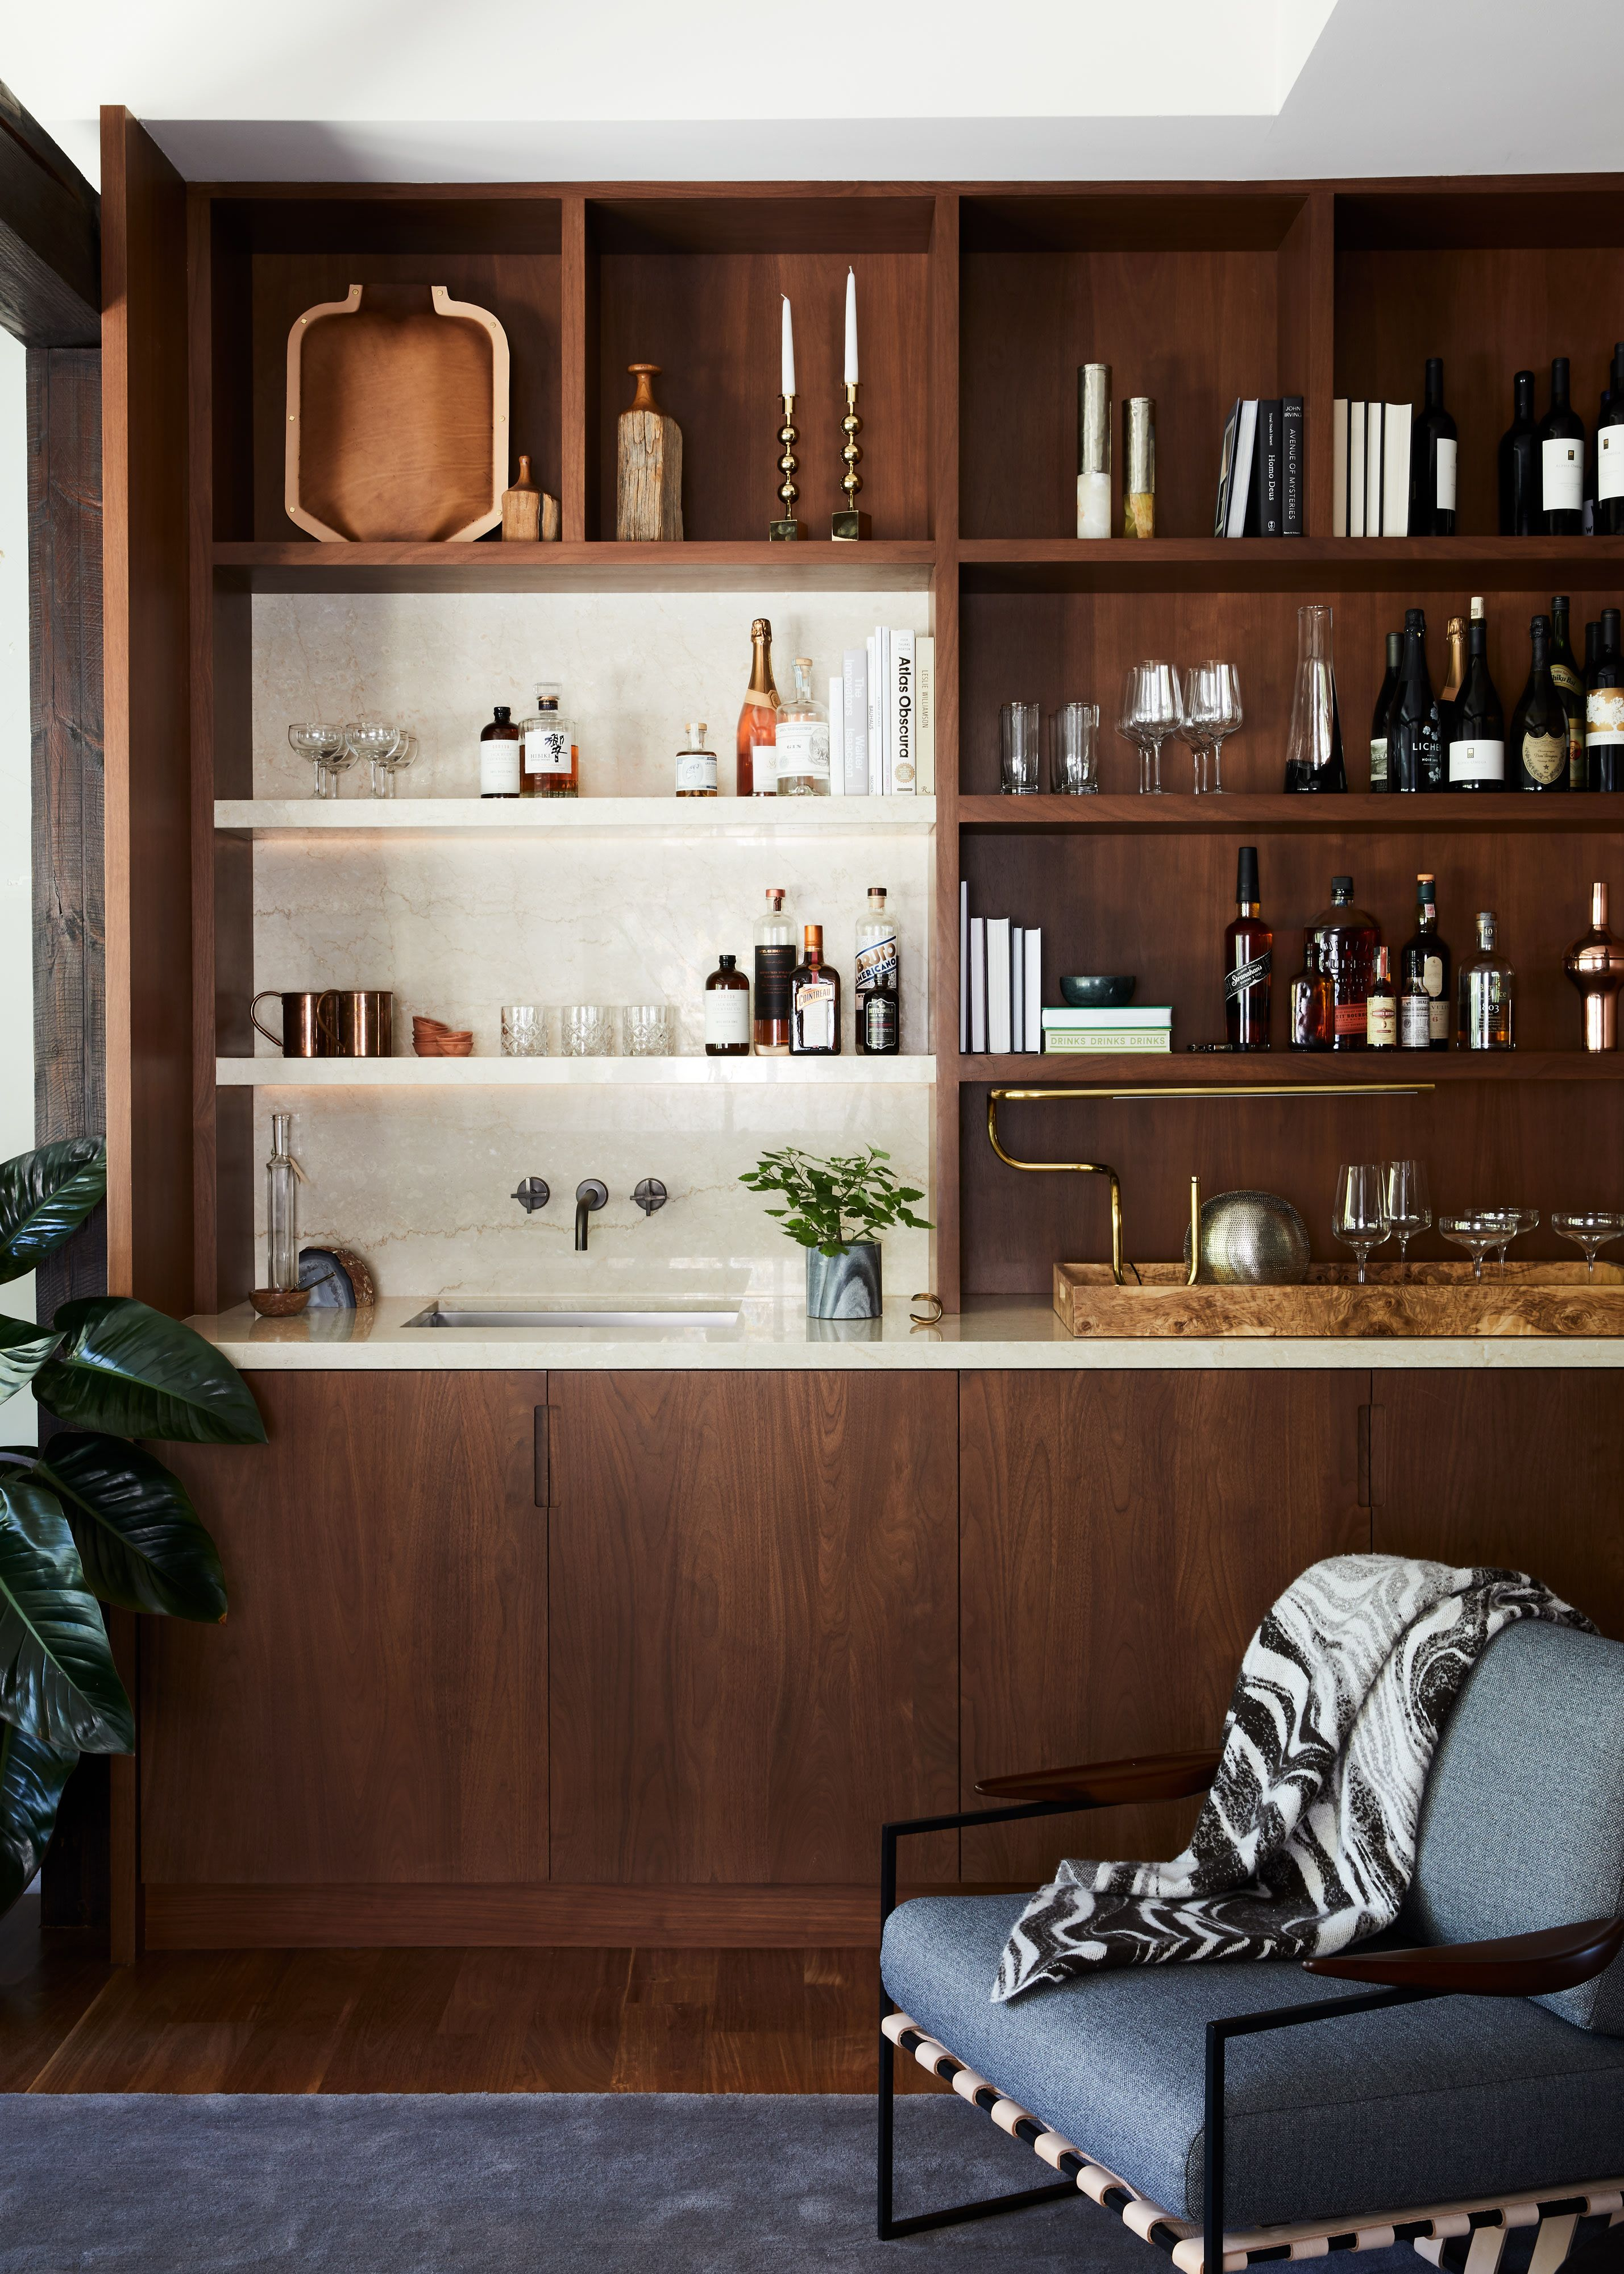 Lauren Geremia San Francisco Bachelor Pad Home Tour With Images